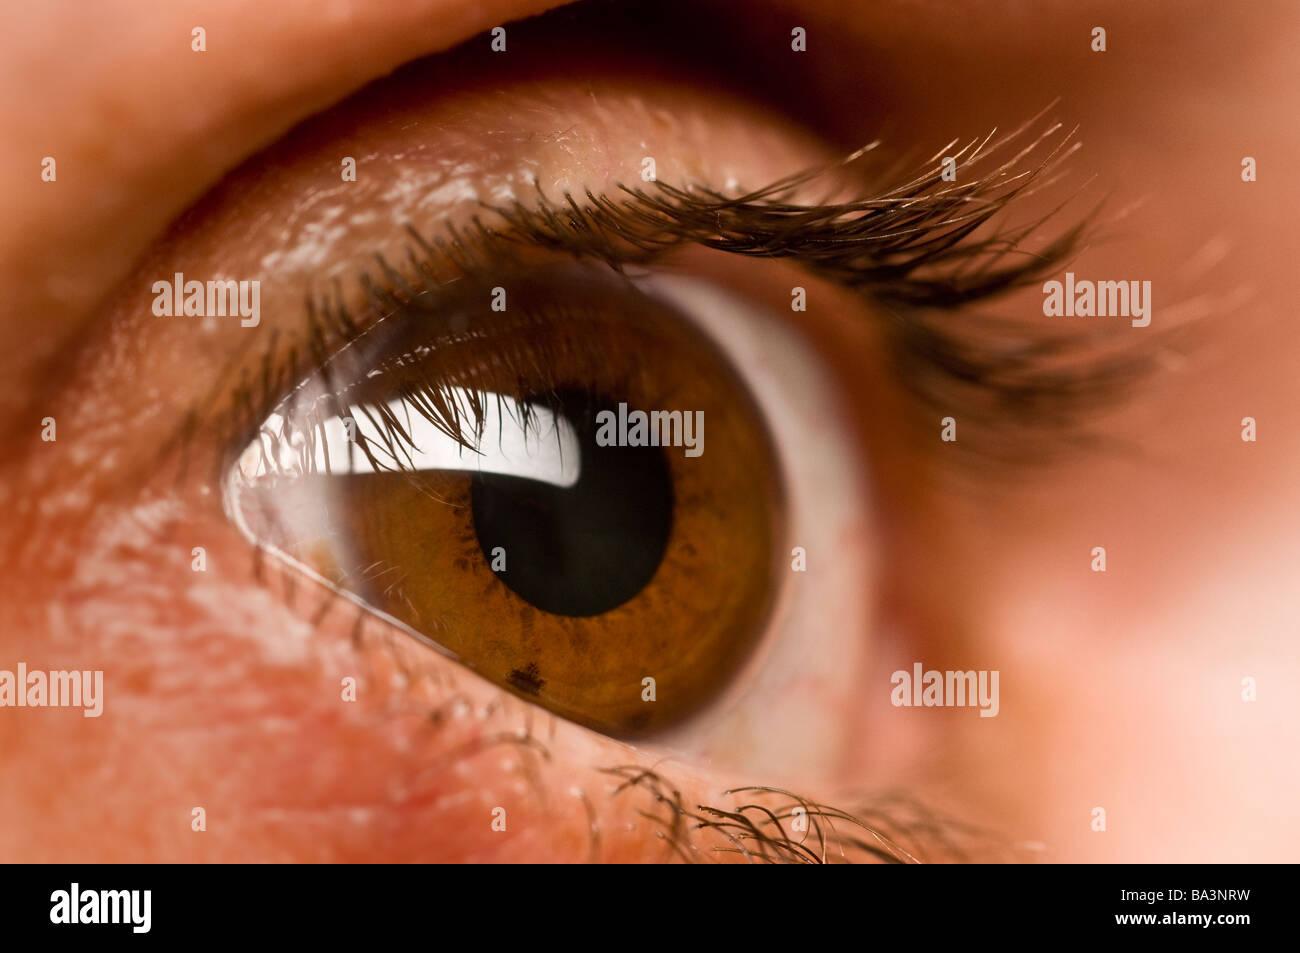 pestañas del ojo Imagen De Stock